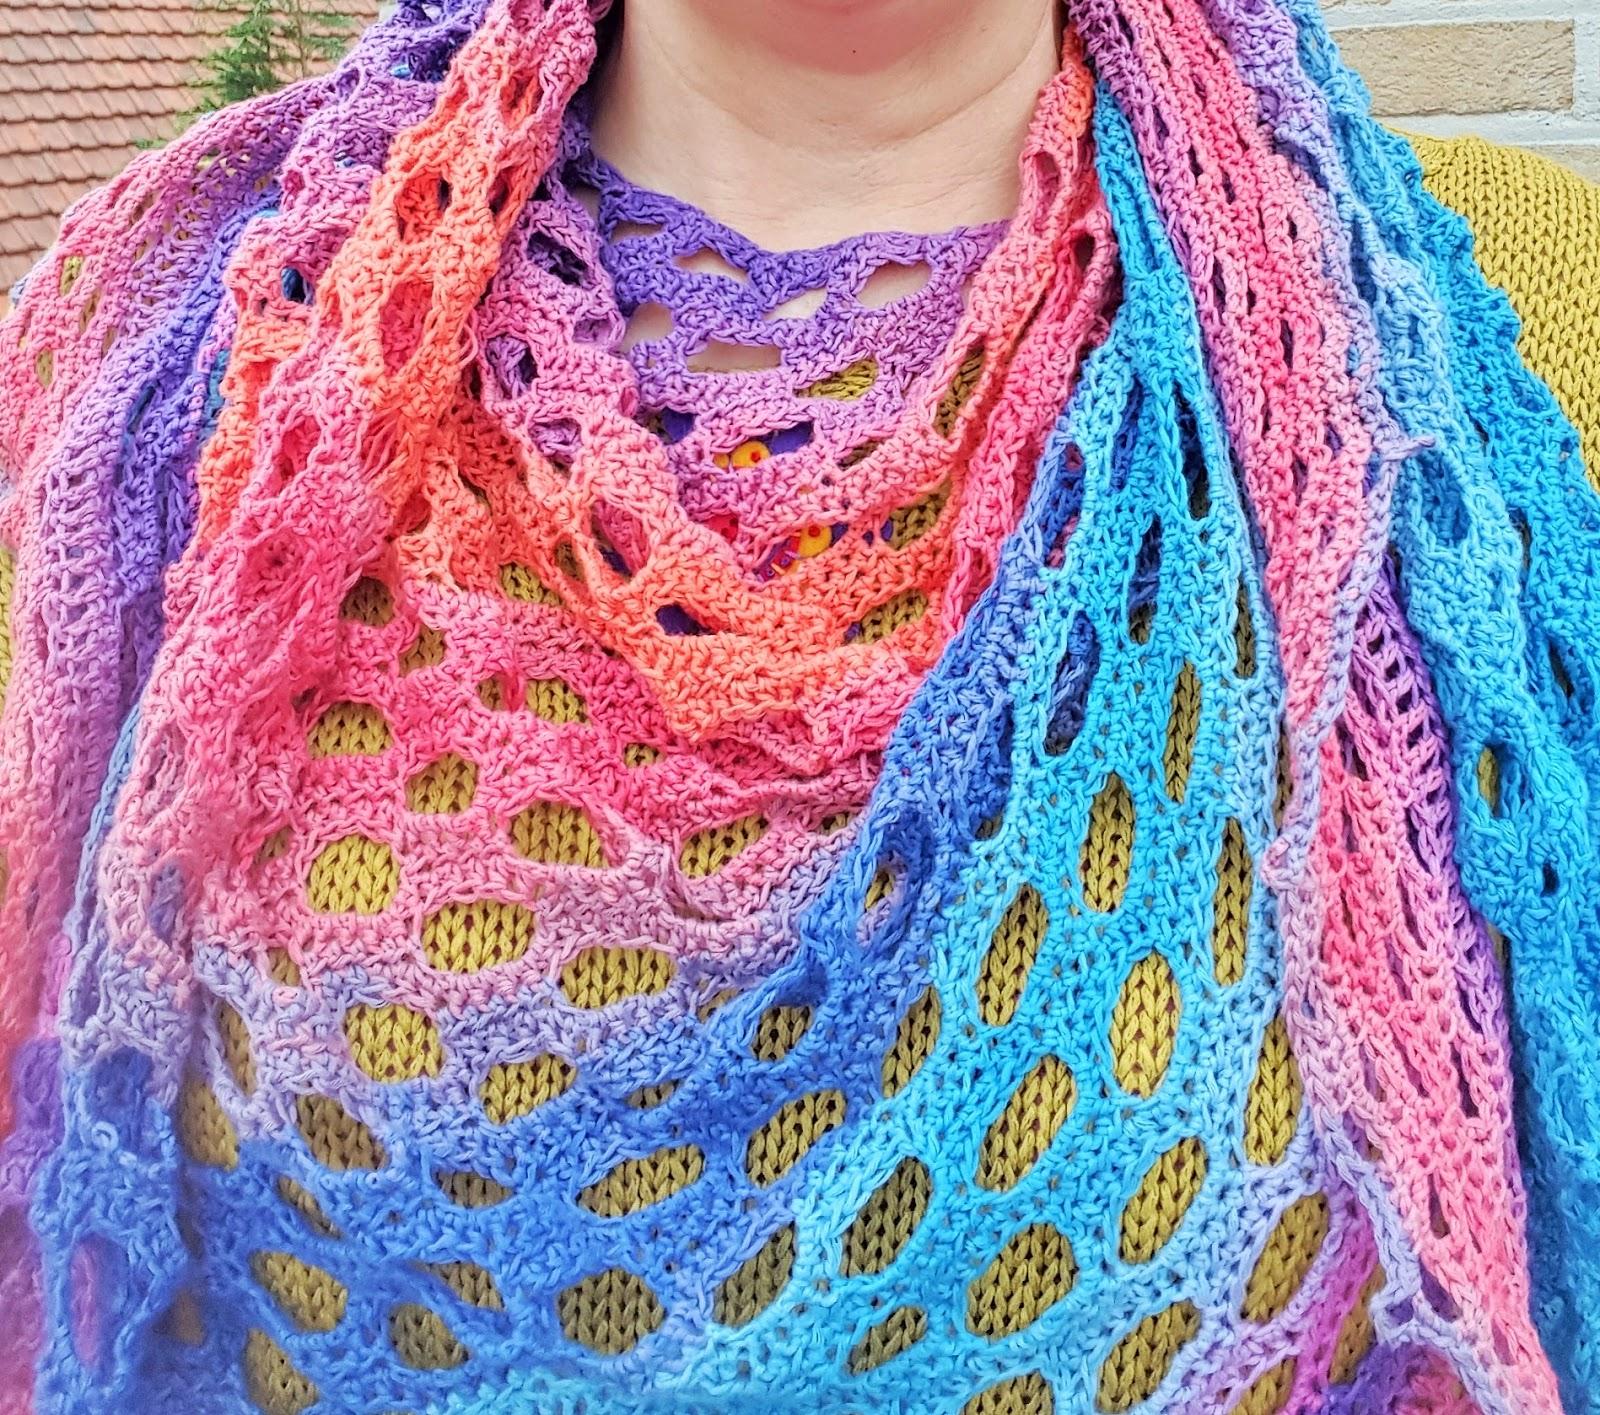 Funkycrochet My Finished Rainbow Bubble Gum Shawl New Crochet Crush Rustic Lace Square Motif